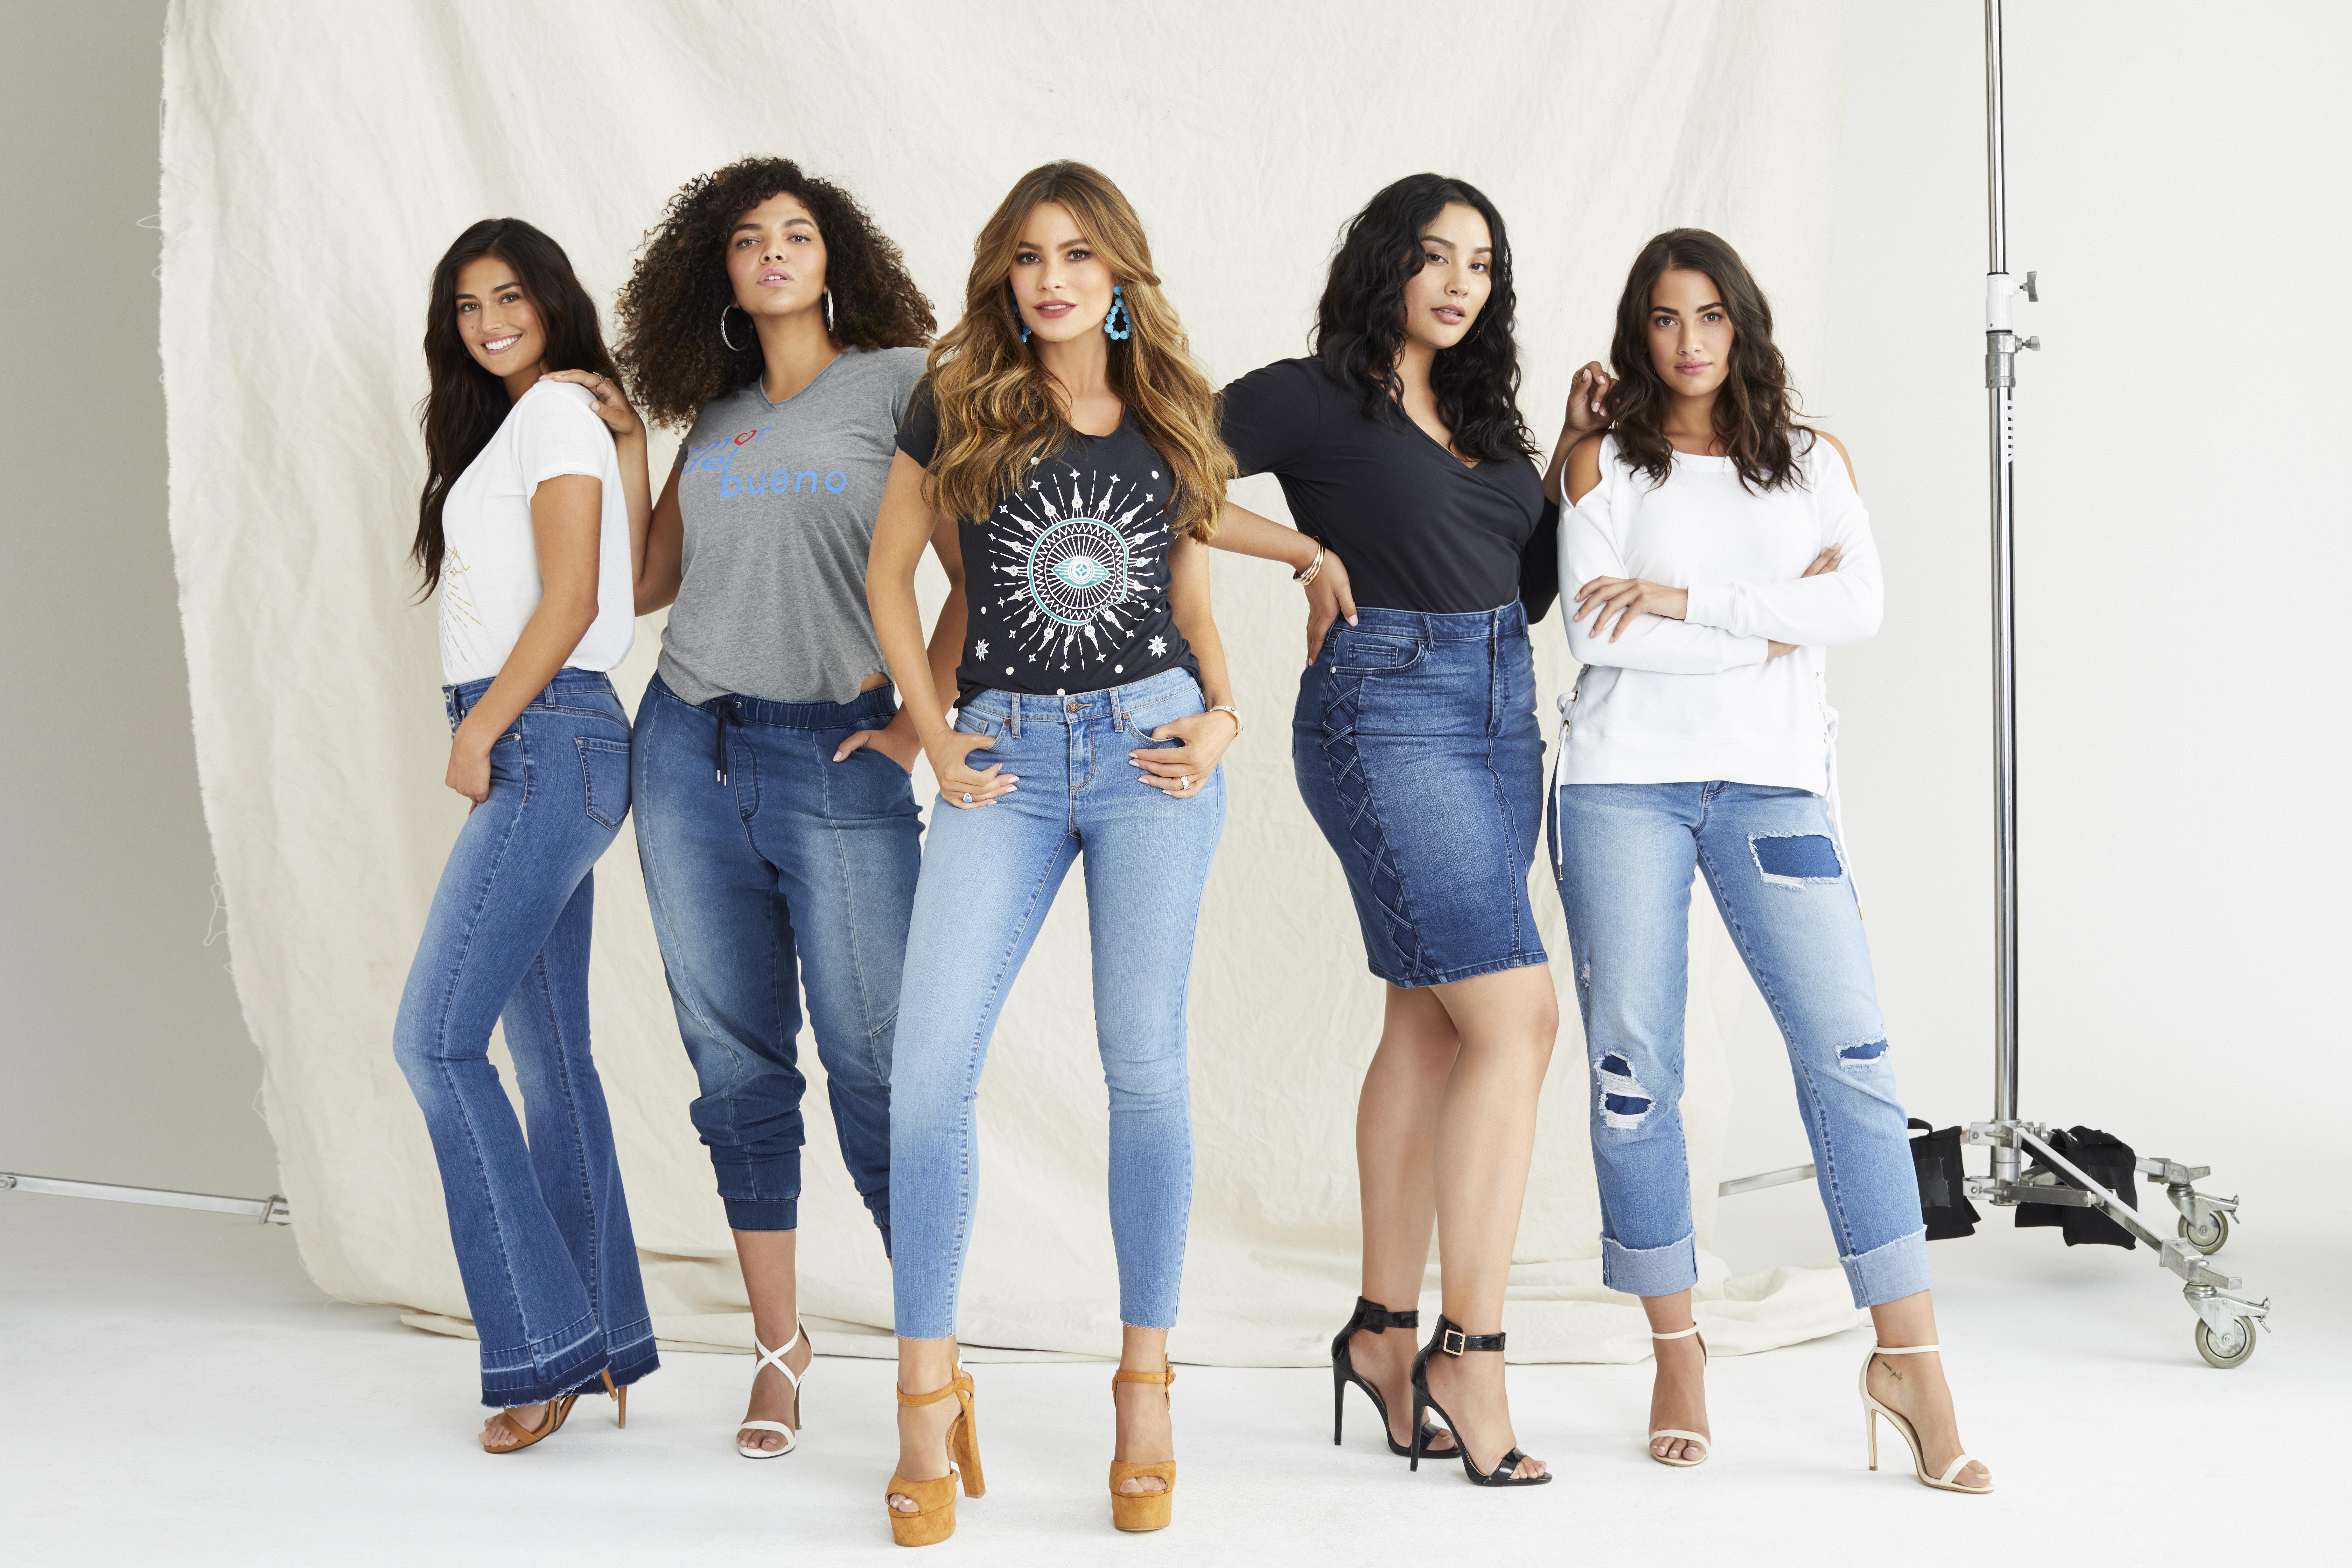 sofia jeans by sofia vergara group shot Sofía Vergaras New Denim Line Is Everything You Love About Expensive Brands—at Walmart.com Prices